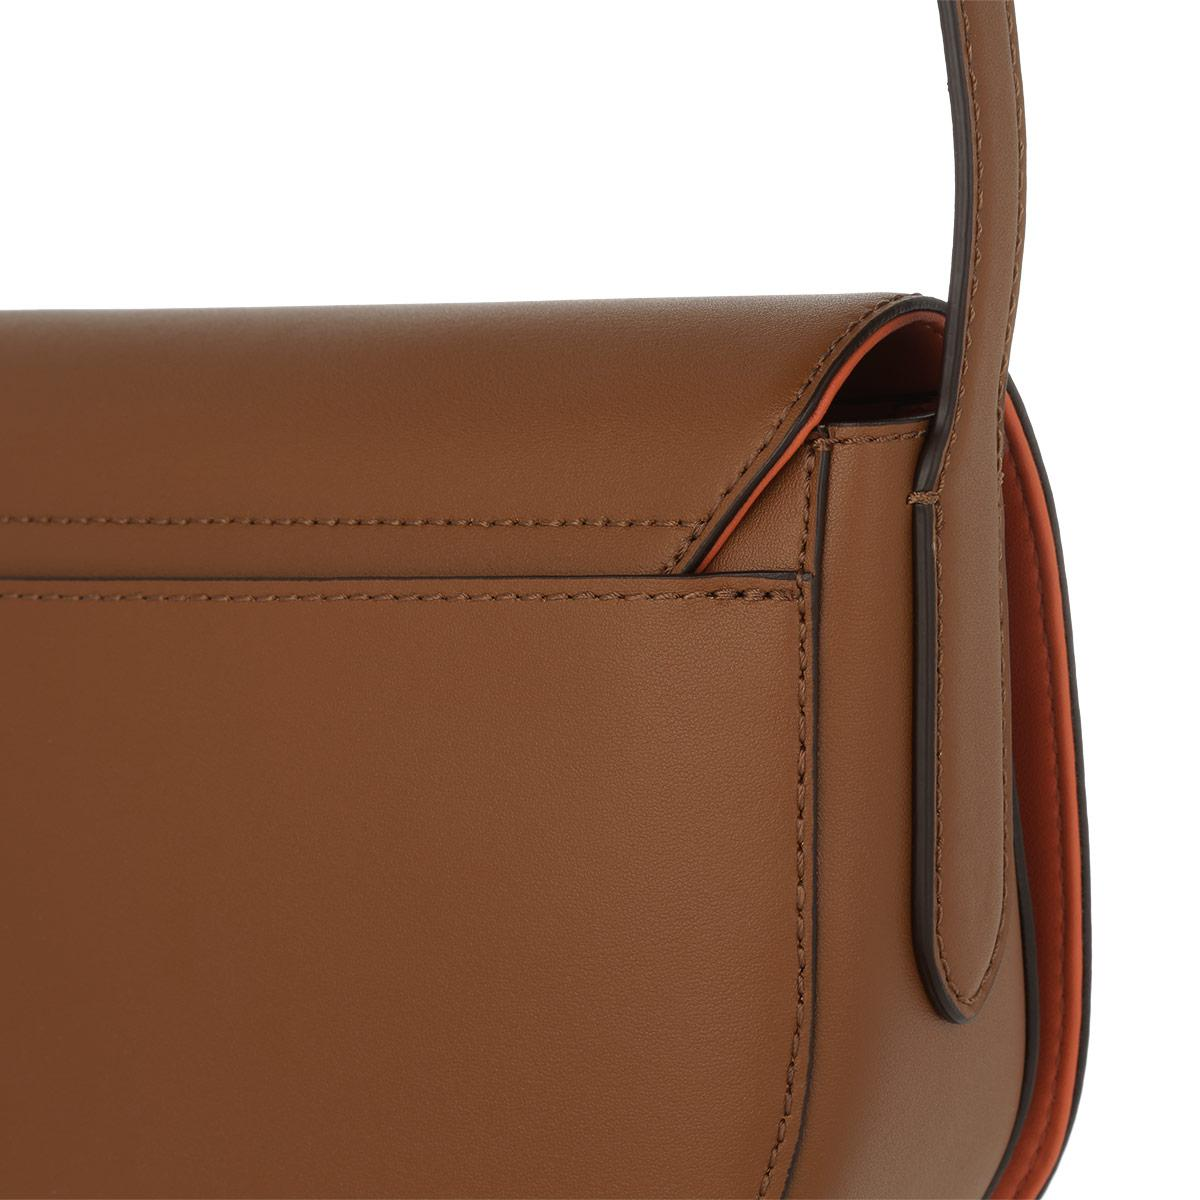 Lauren by Ralph Lauren Caley Mini Saddle Bag Field Brown monarch ... 98263487cb